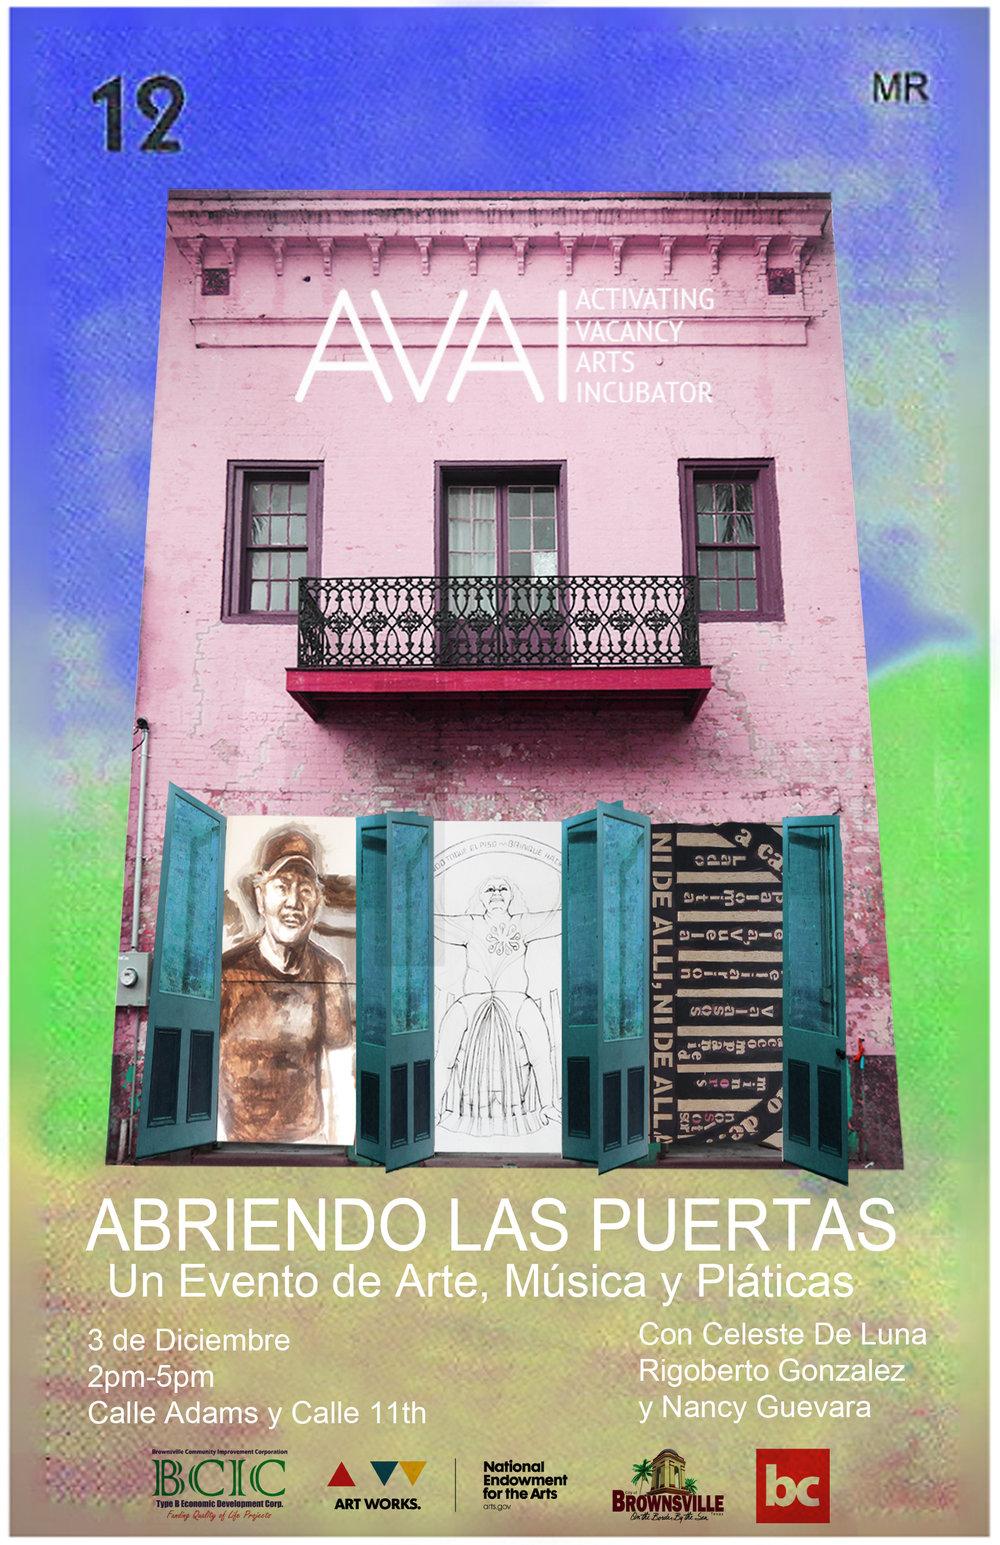 Flyer for AVAI event Abriendo Las Puertas